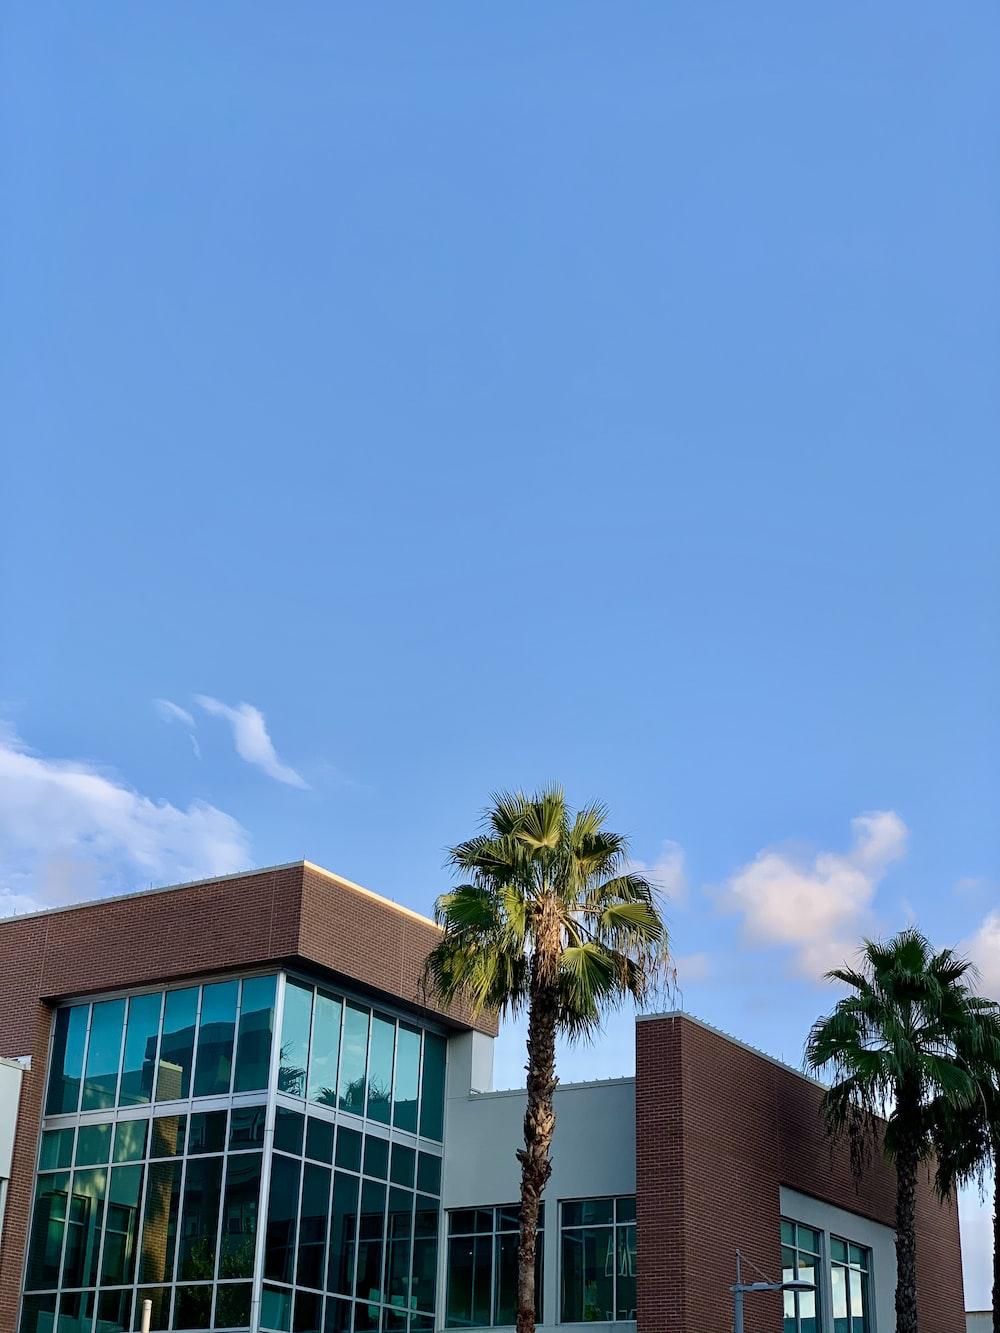 palm tree beside concrete building